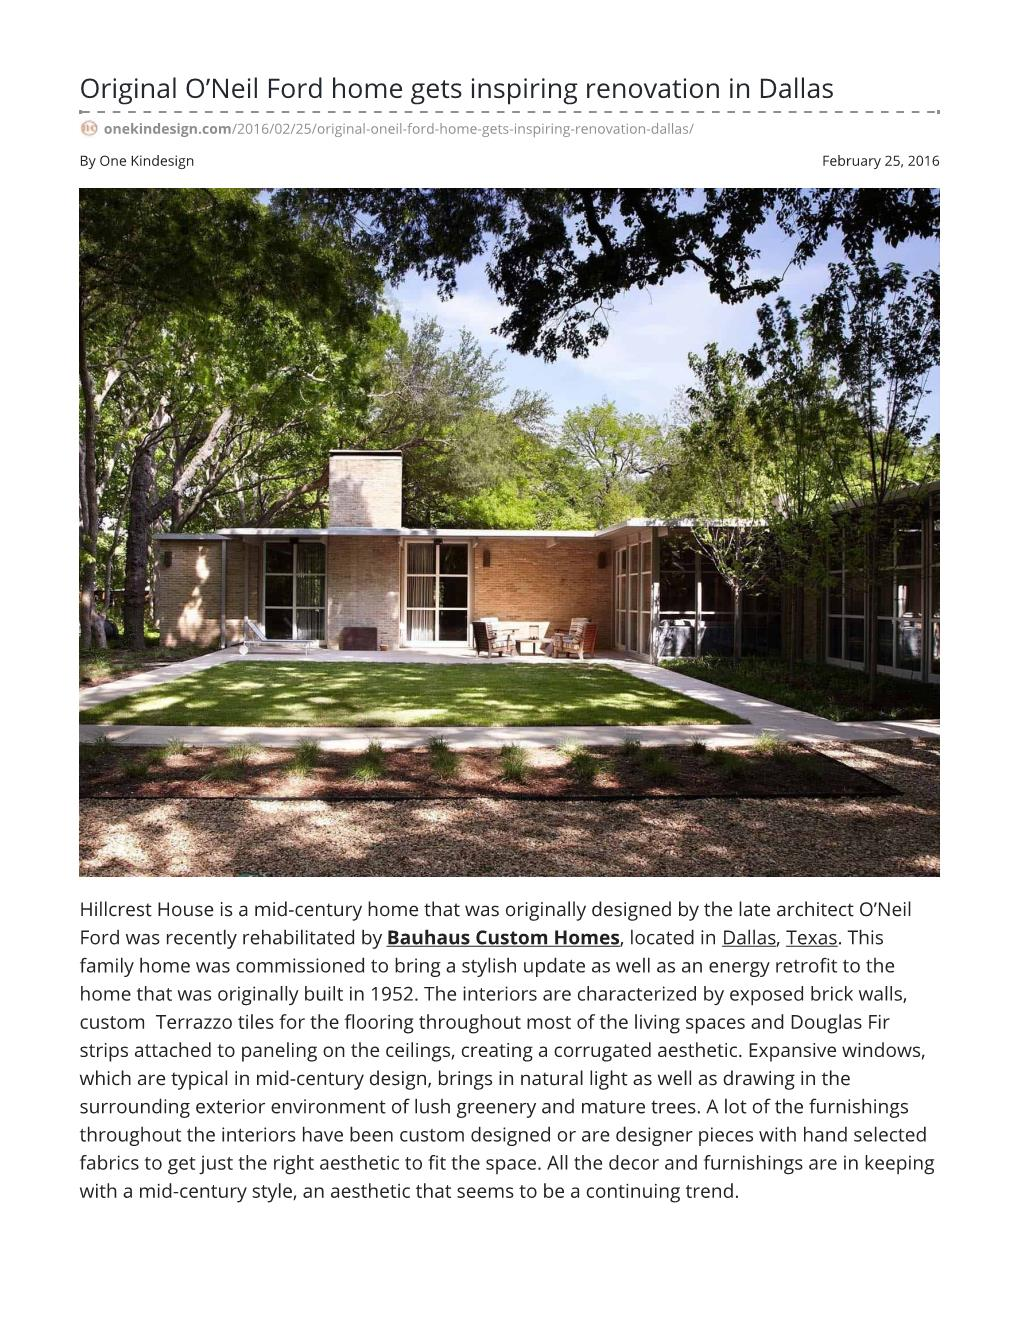 onekindesign.com-Original ONeil Ford home gets inspiring renovation in Dallas.jpg